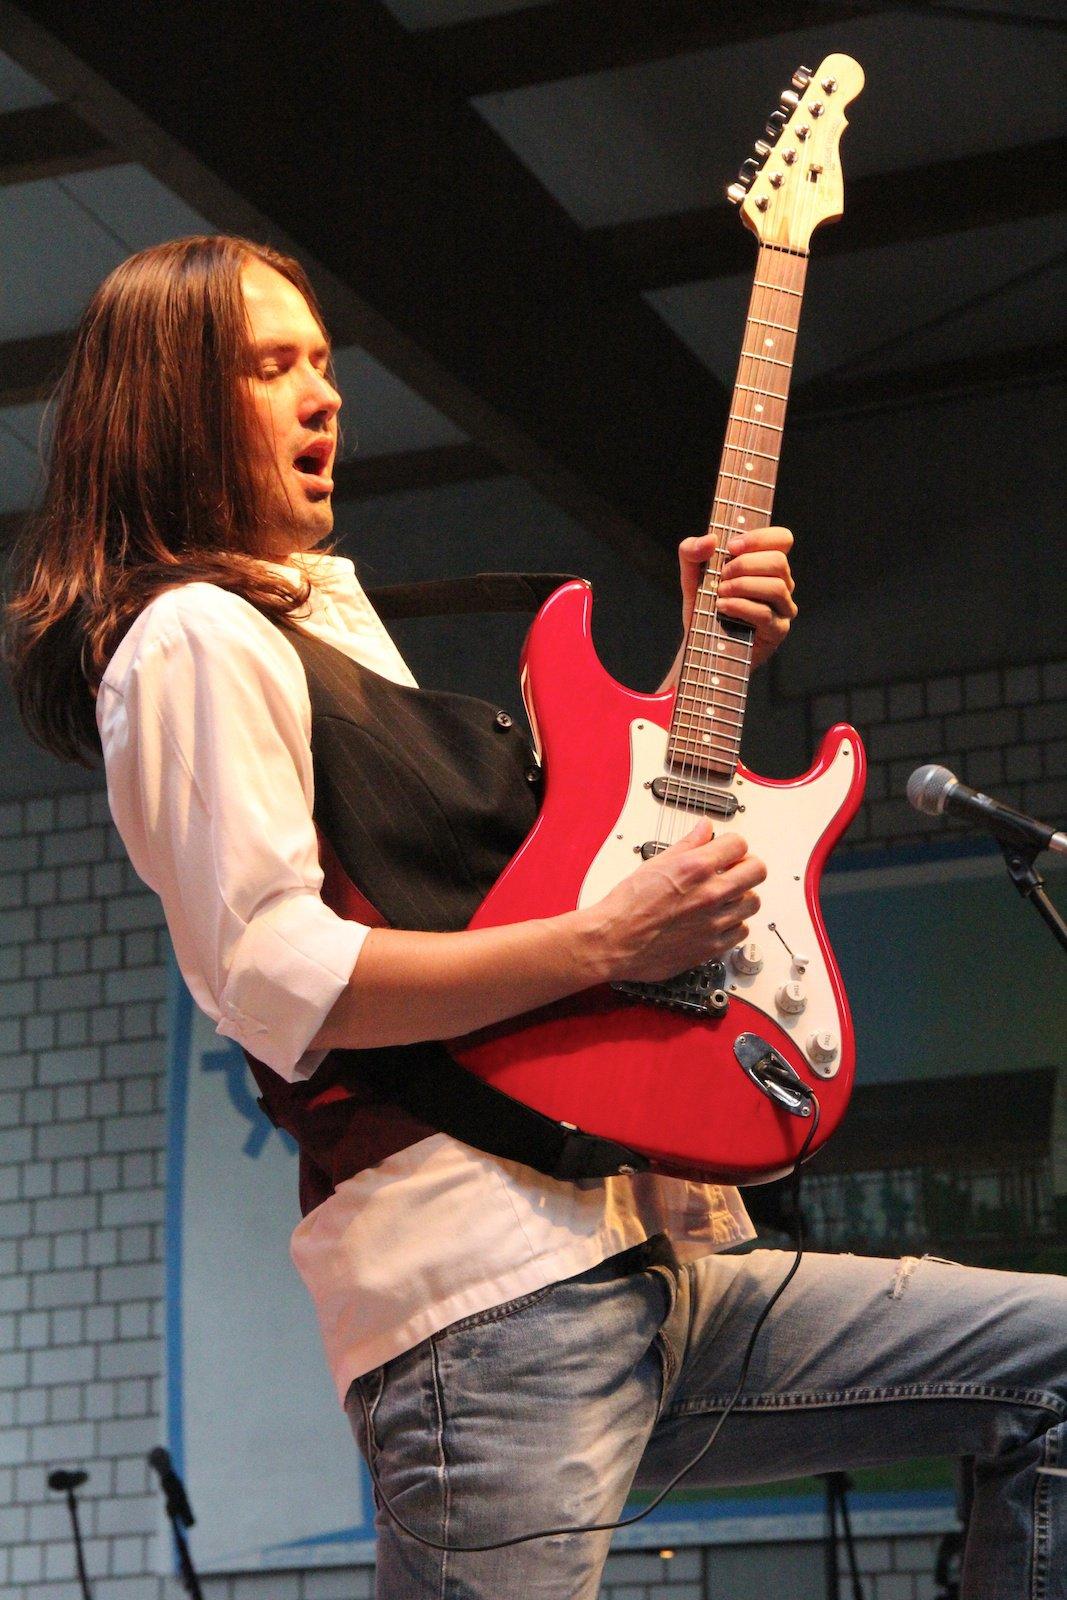 Stainless Quo - Sommerfesthalle, Otterstadt 18.06.2011 - 19